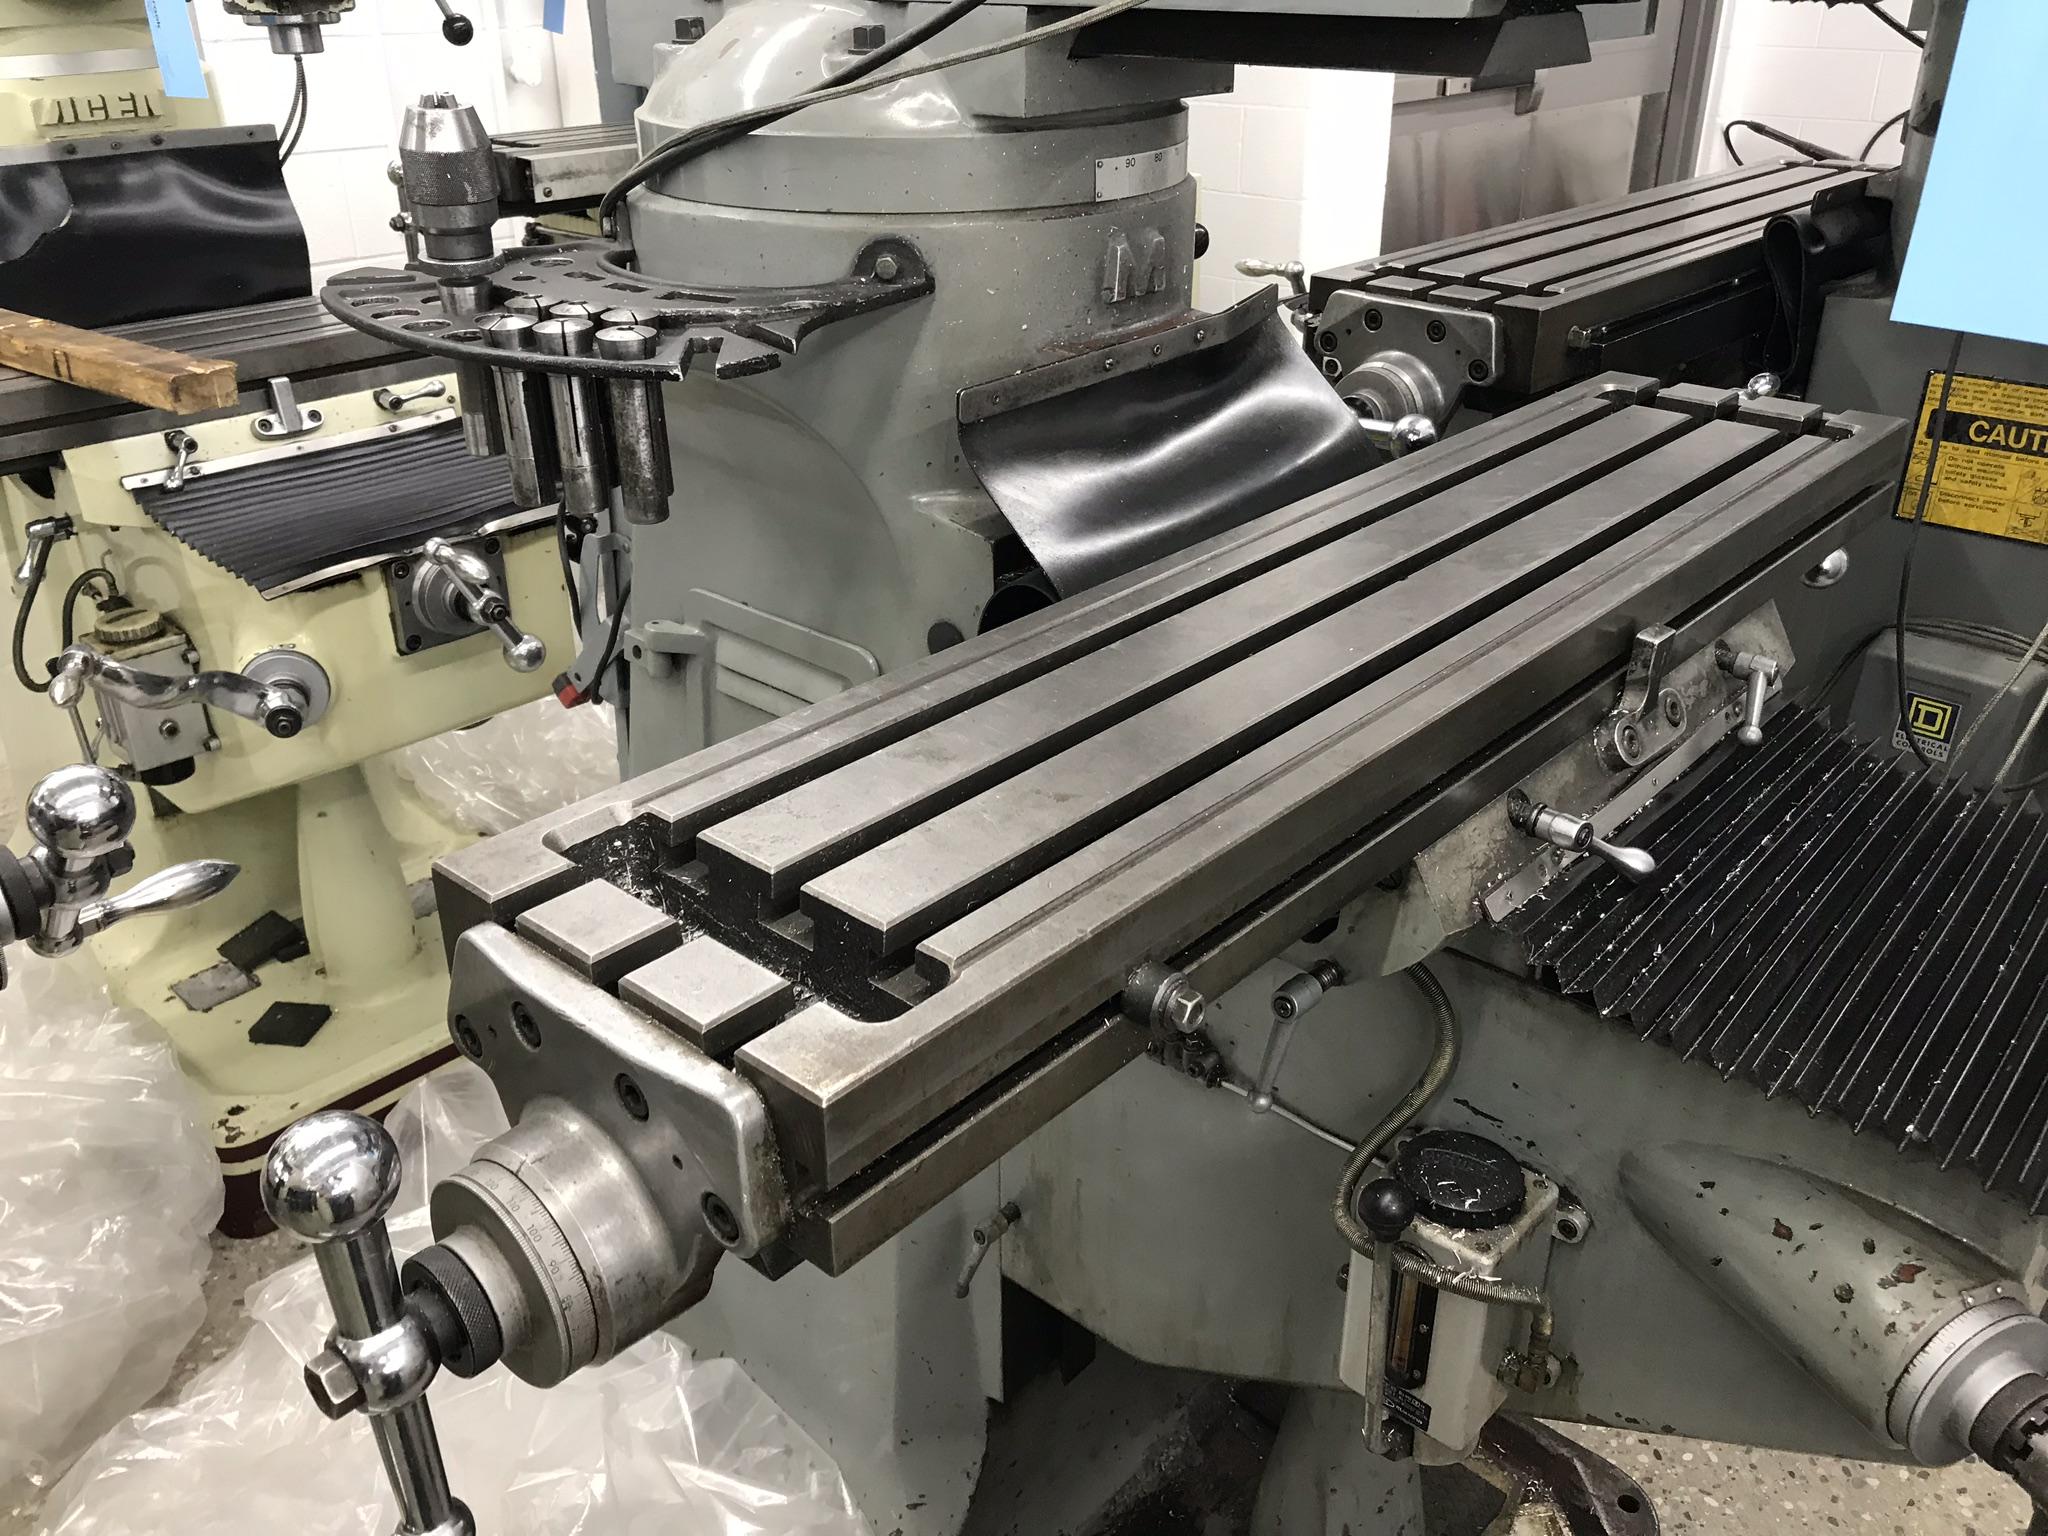 "Supermax Titan Series Vertical Mill Model YO-1.5VS-T, 9"" x 42"" Table Sargon 3- Axis DRO, Collets, - Image 2 of 4"